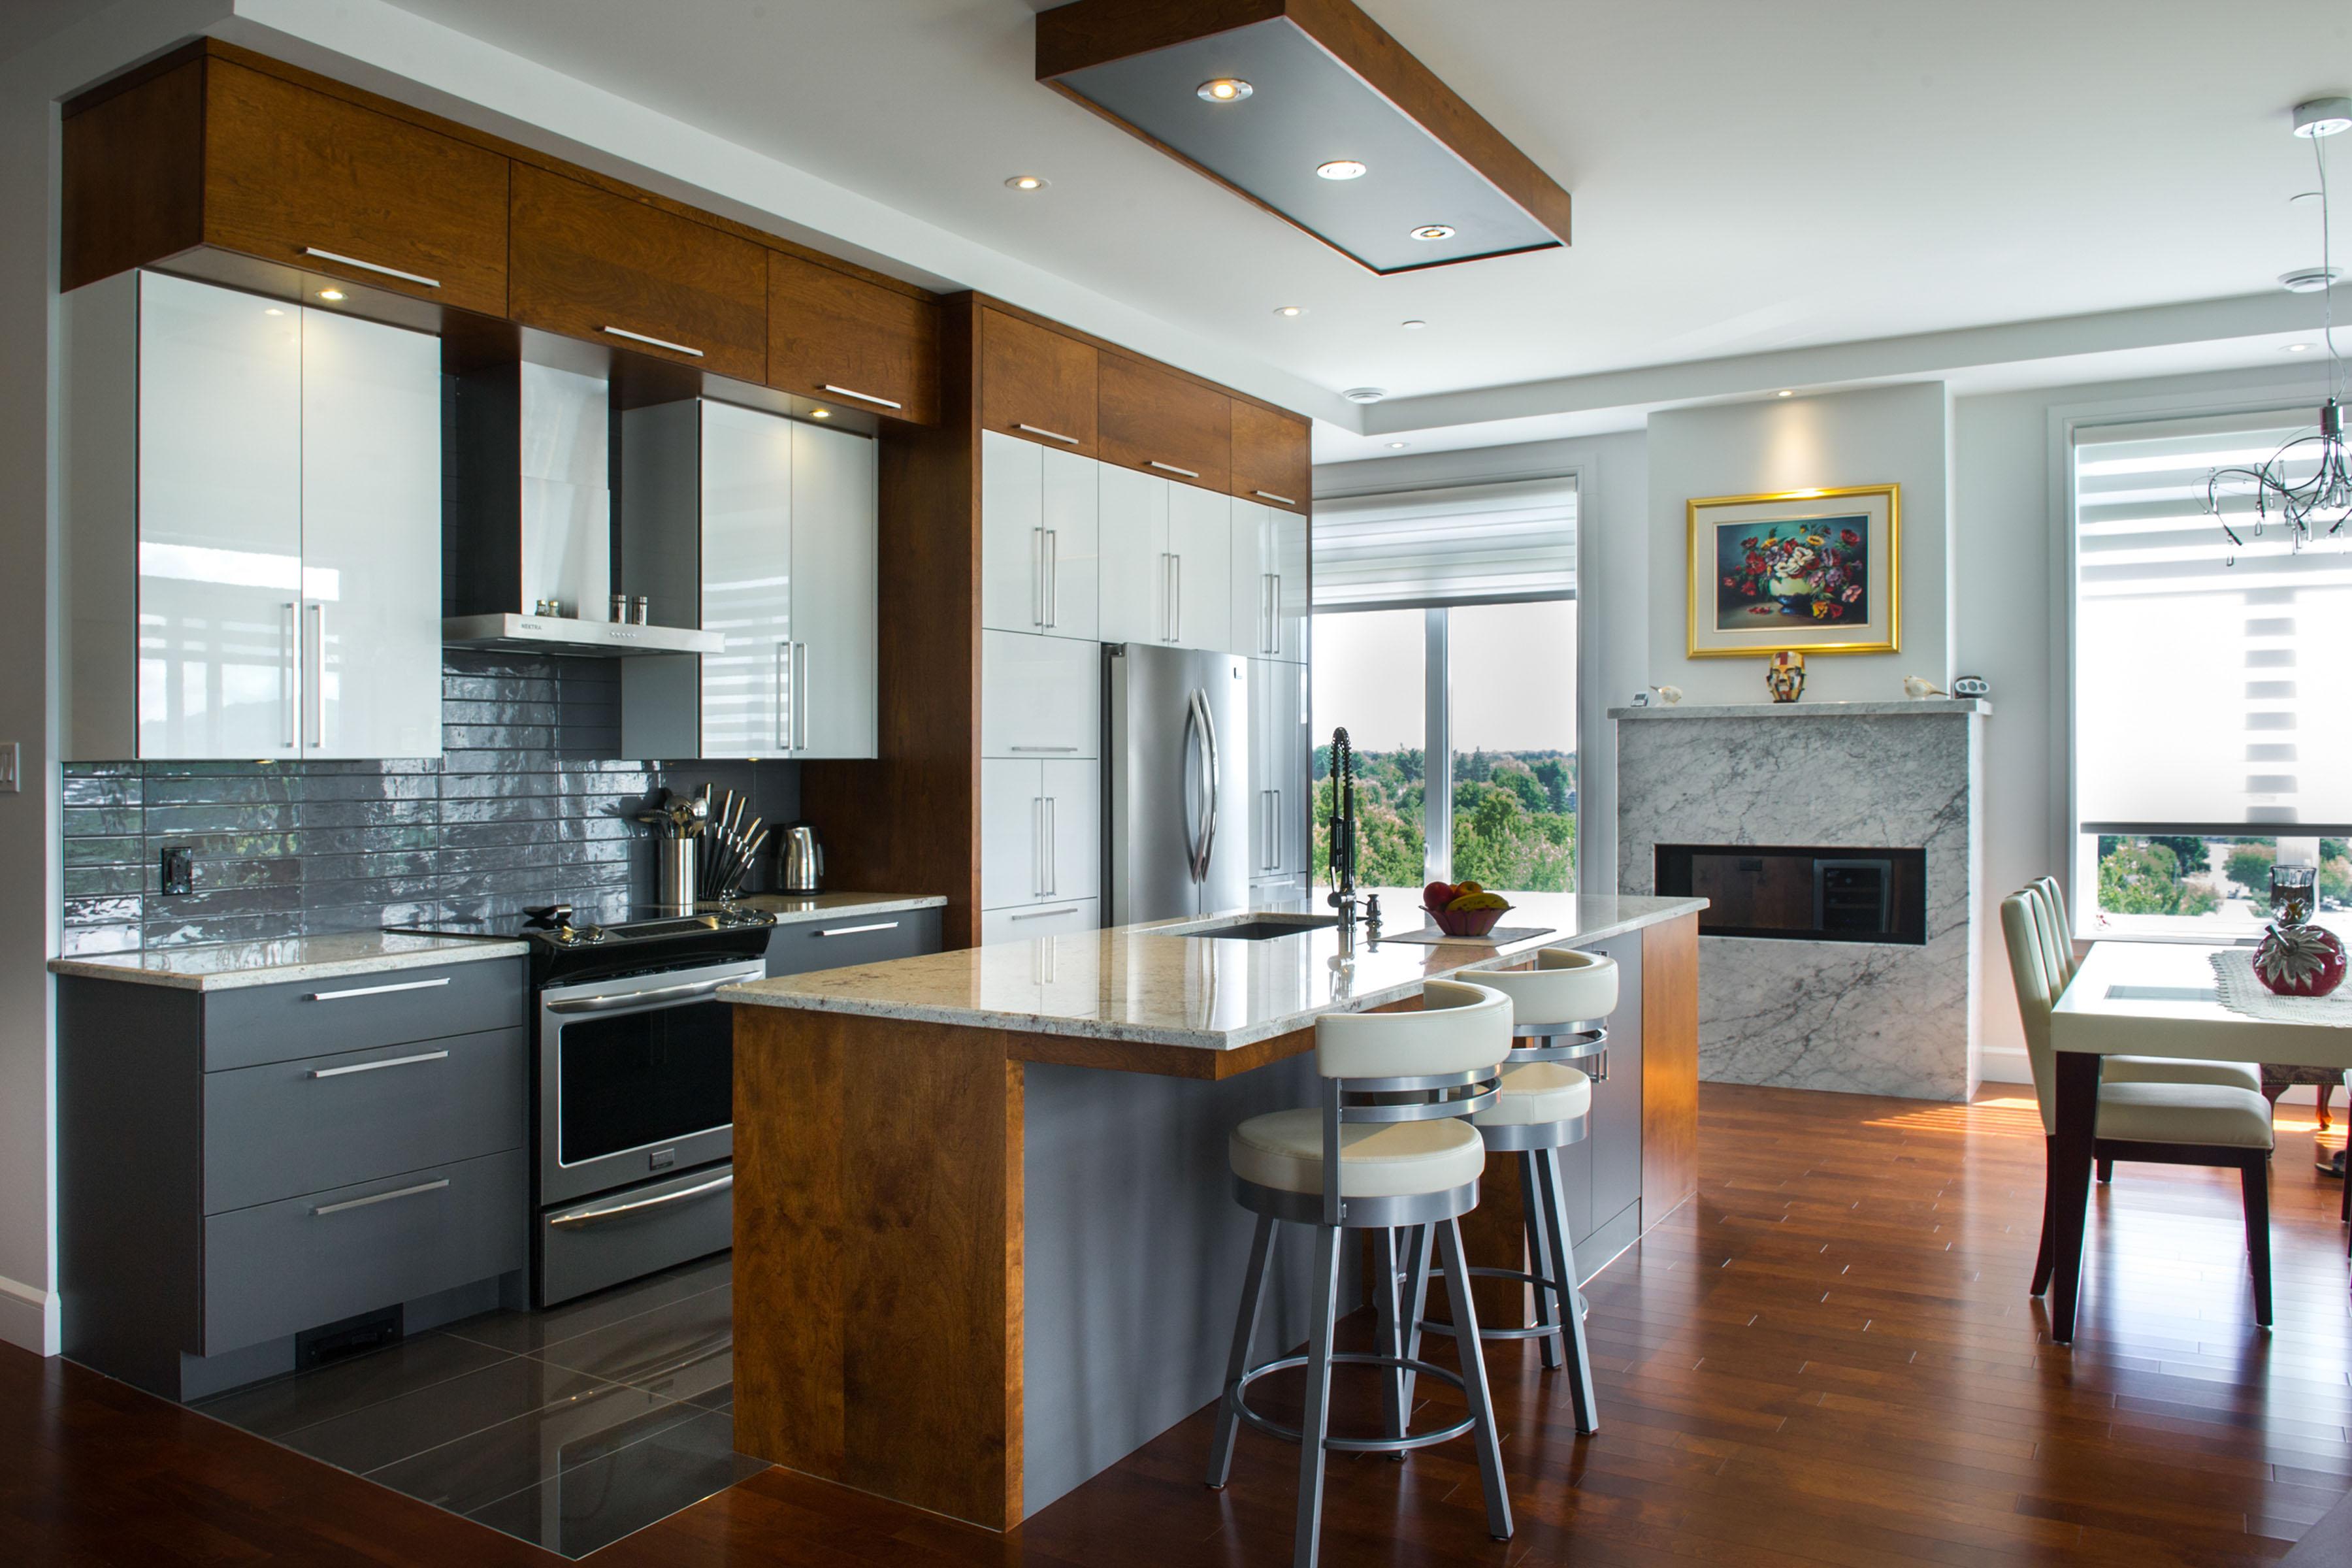 01 kalla cuisine design. Black Bedroom Furniture Sets. Home Design Ideas